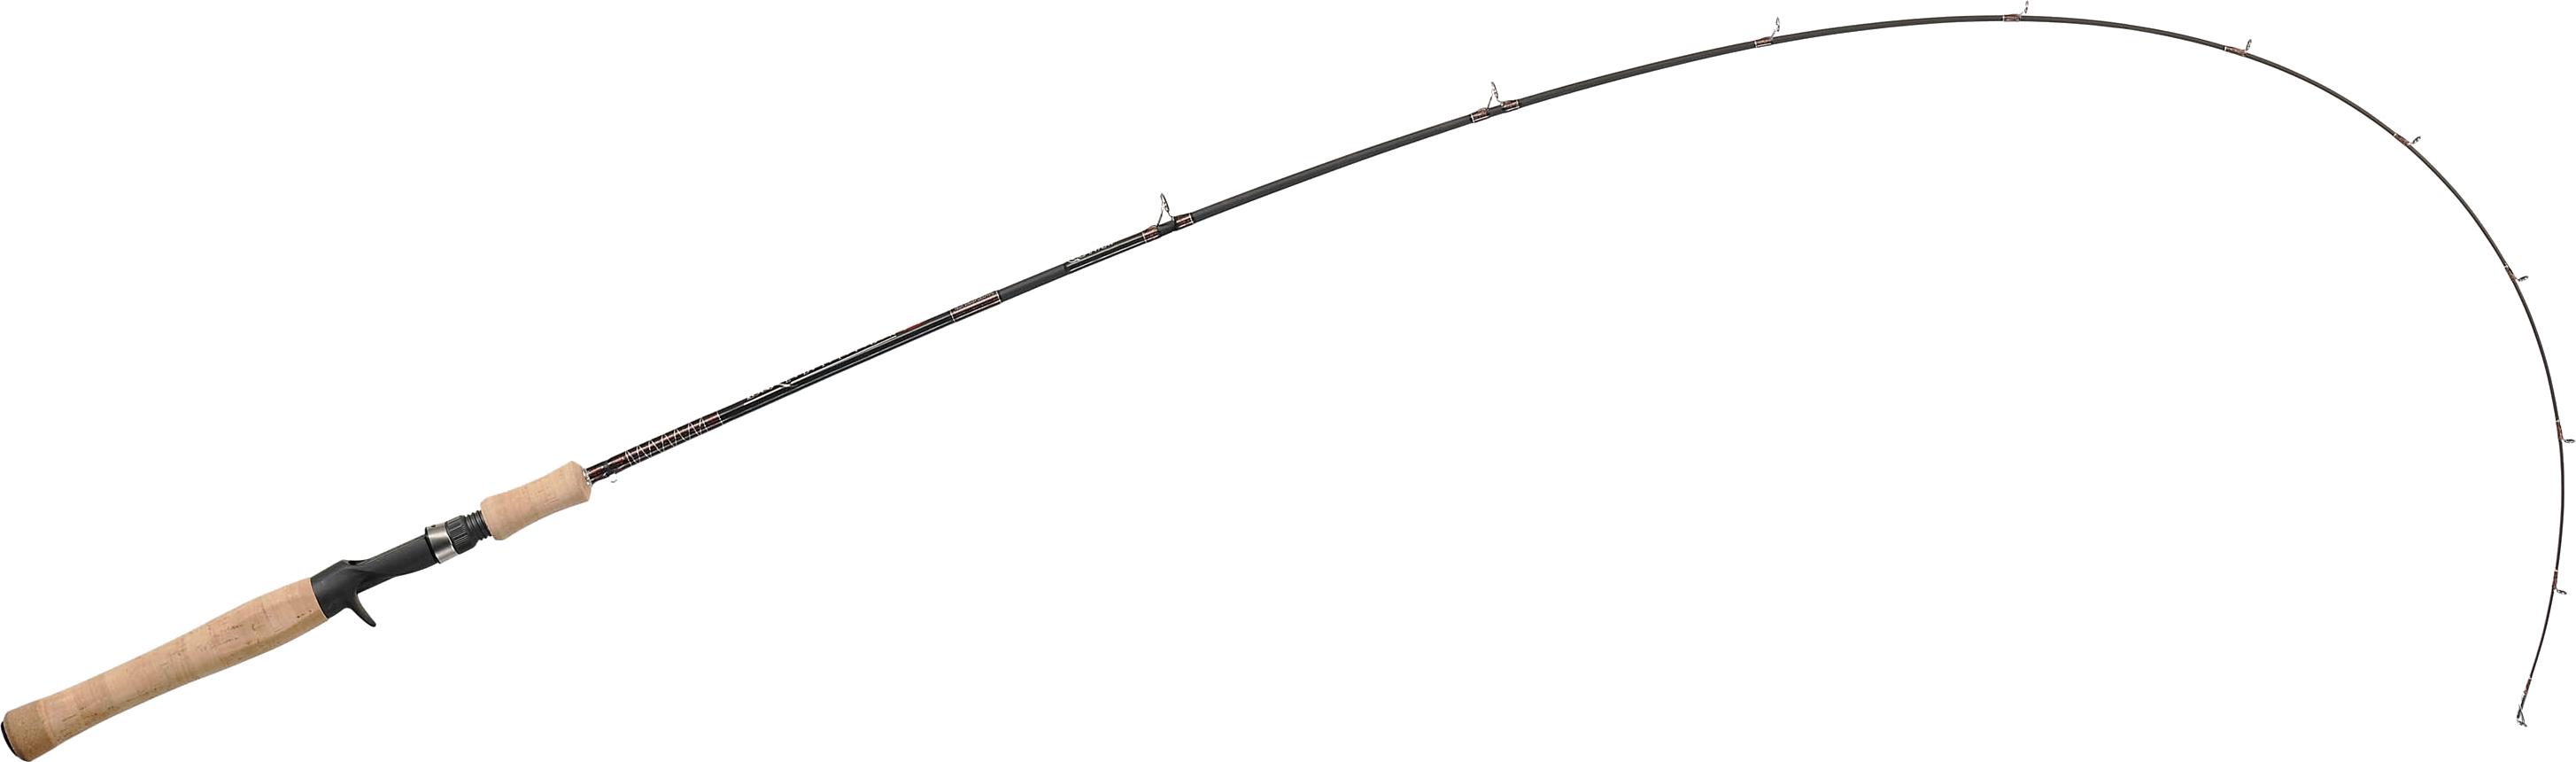 Fishing Pole PNG